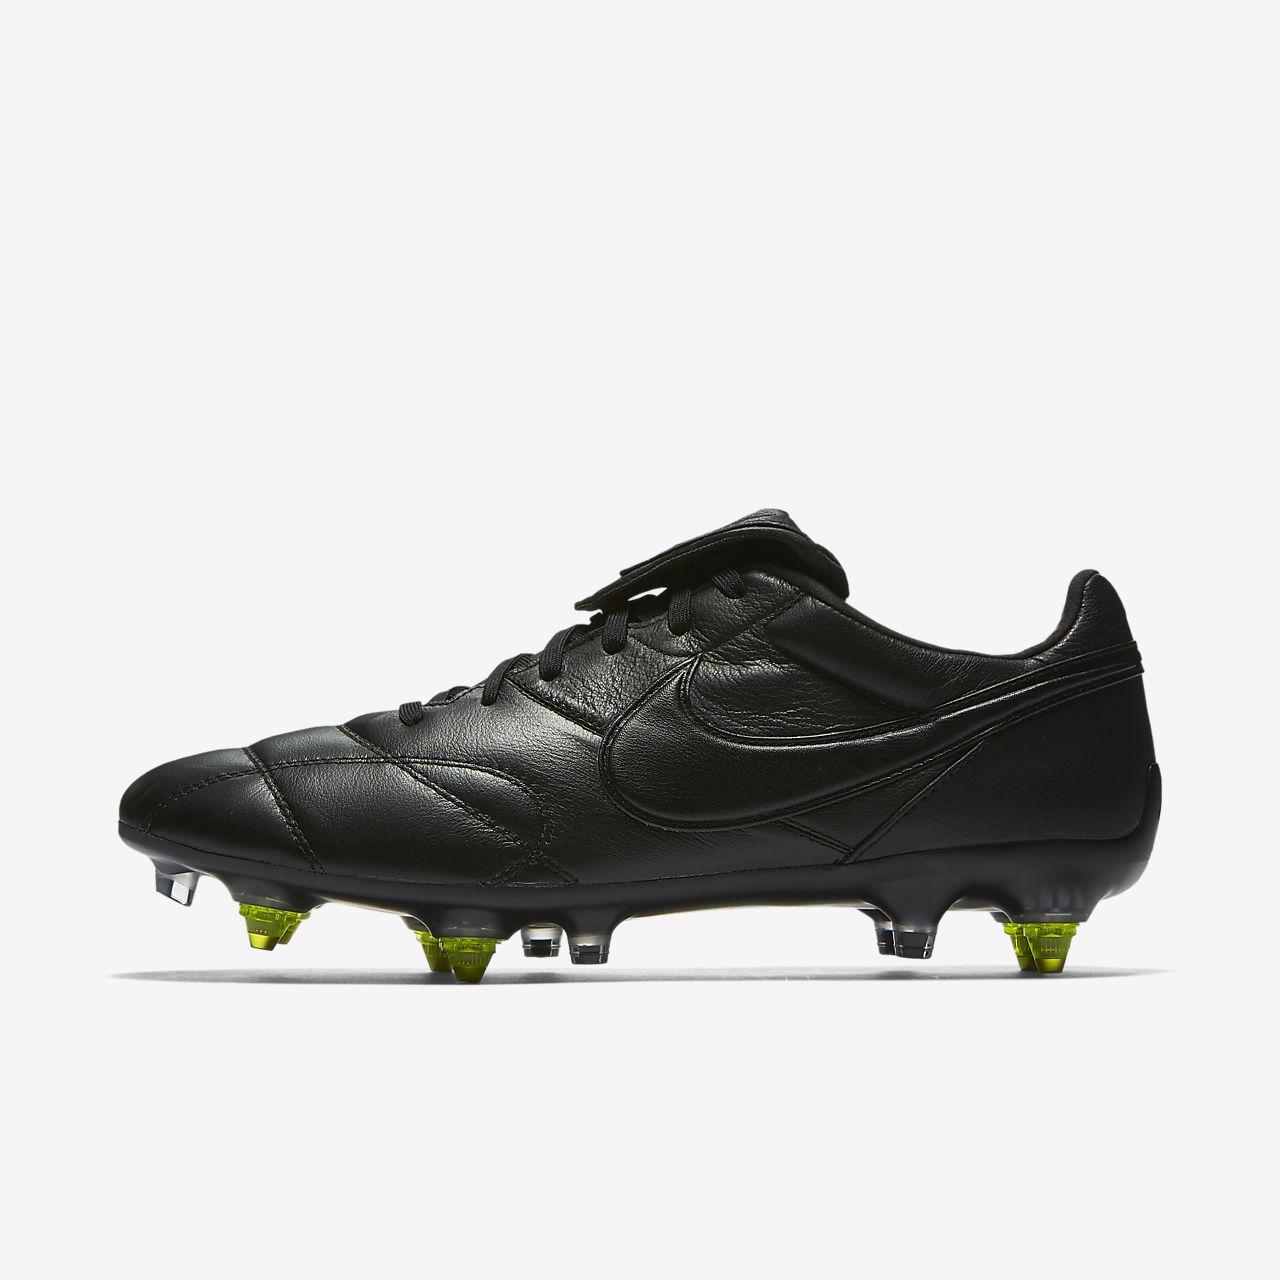 4a62ff640857 Футбольные бутсы для игры на мягком грунте Nike Premier II Anti-Clog  Traction SG-